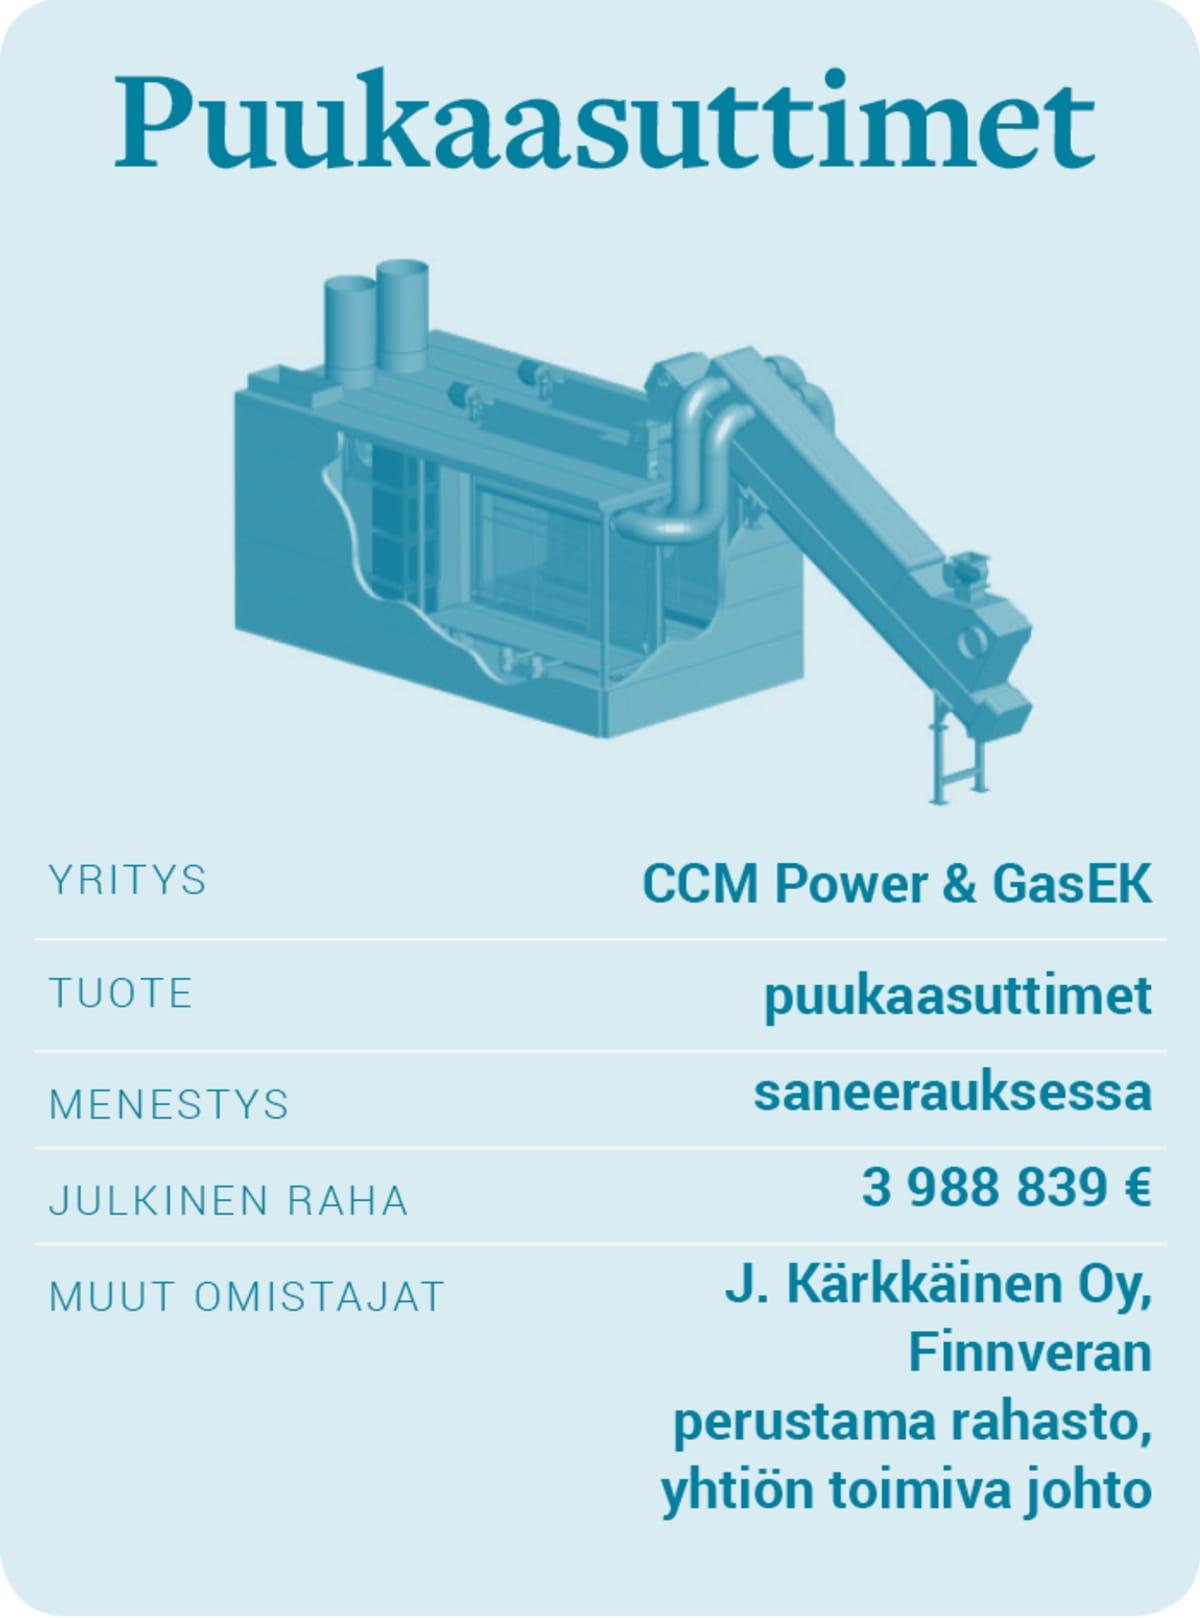 CCM Power ja GasEK -puukaasuttimet.